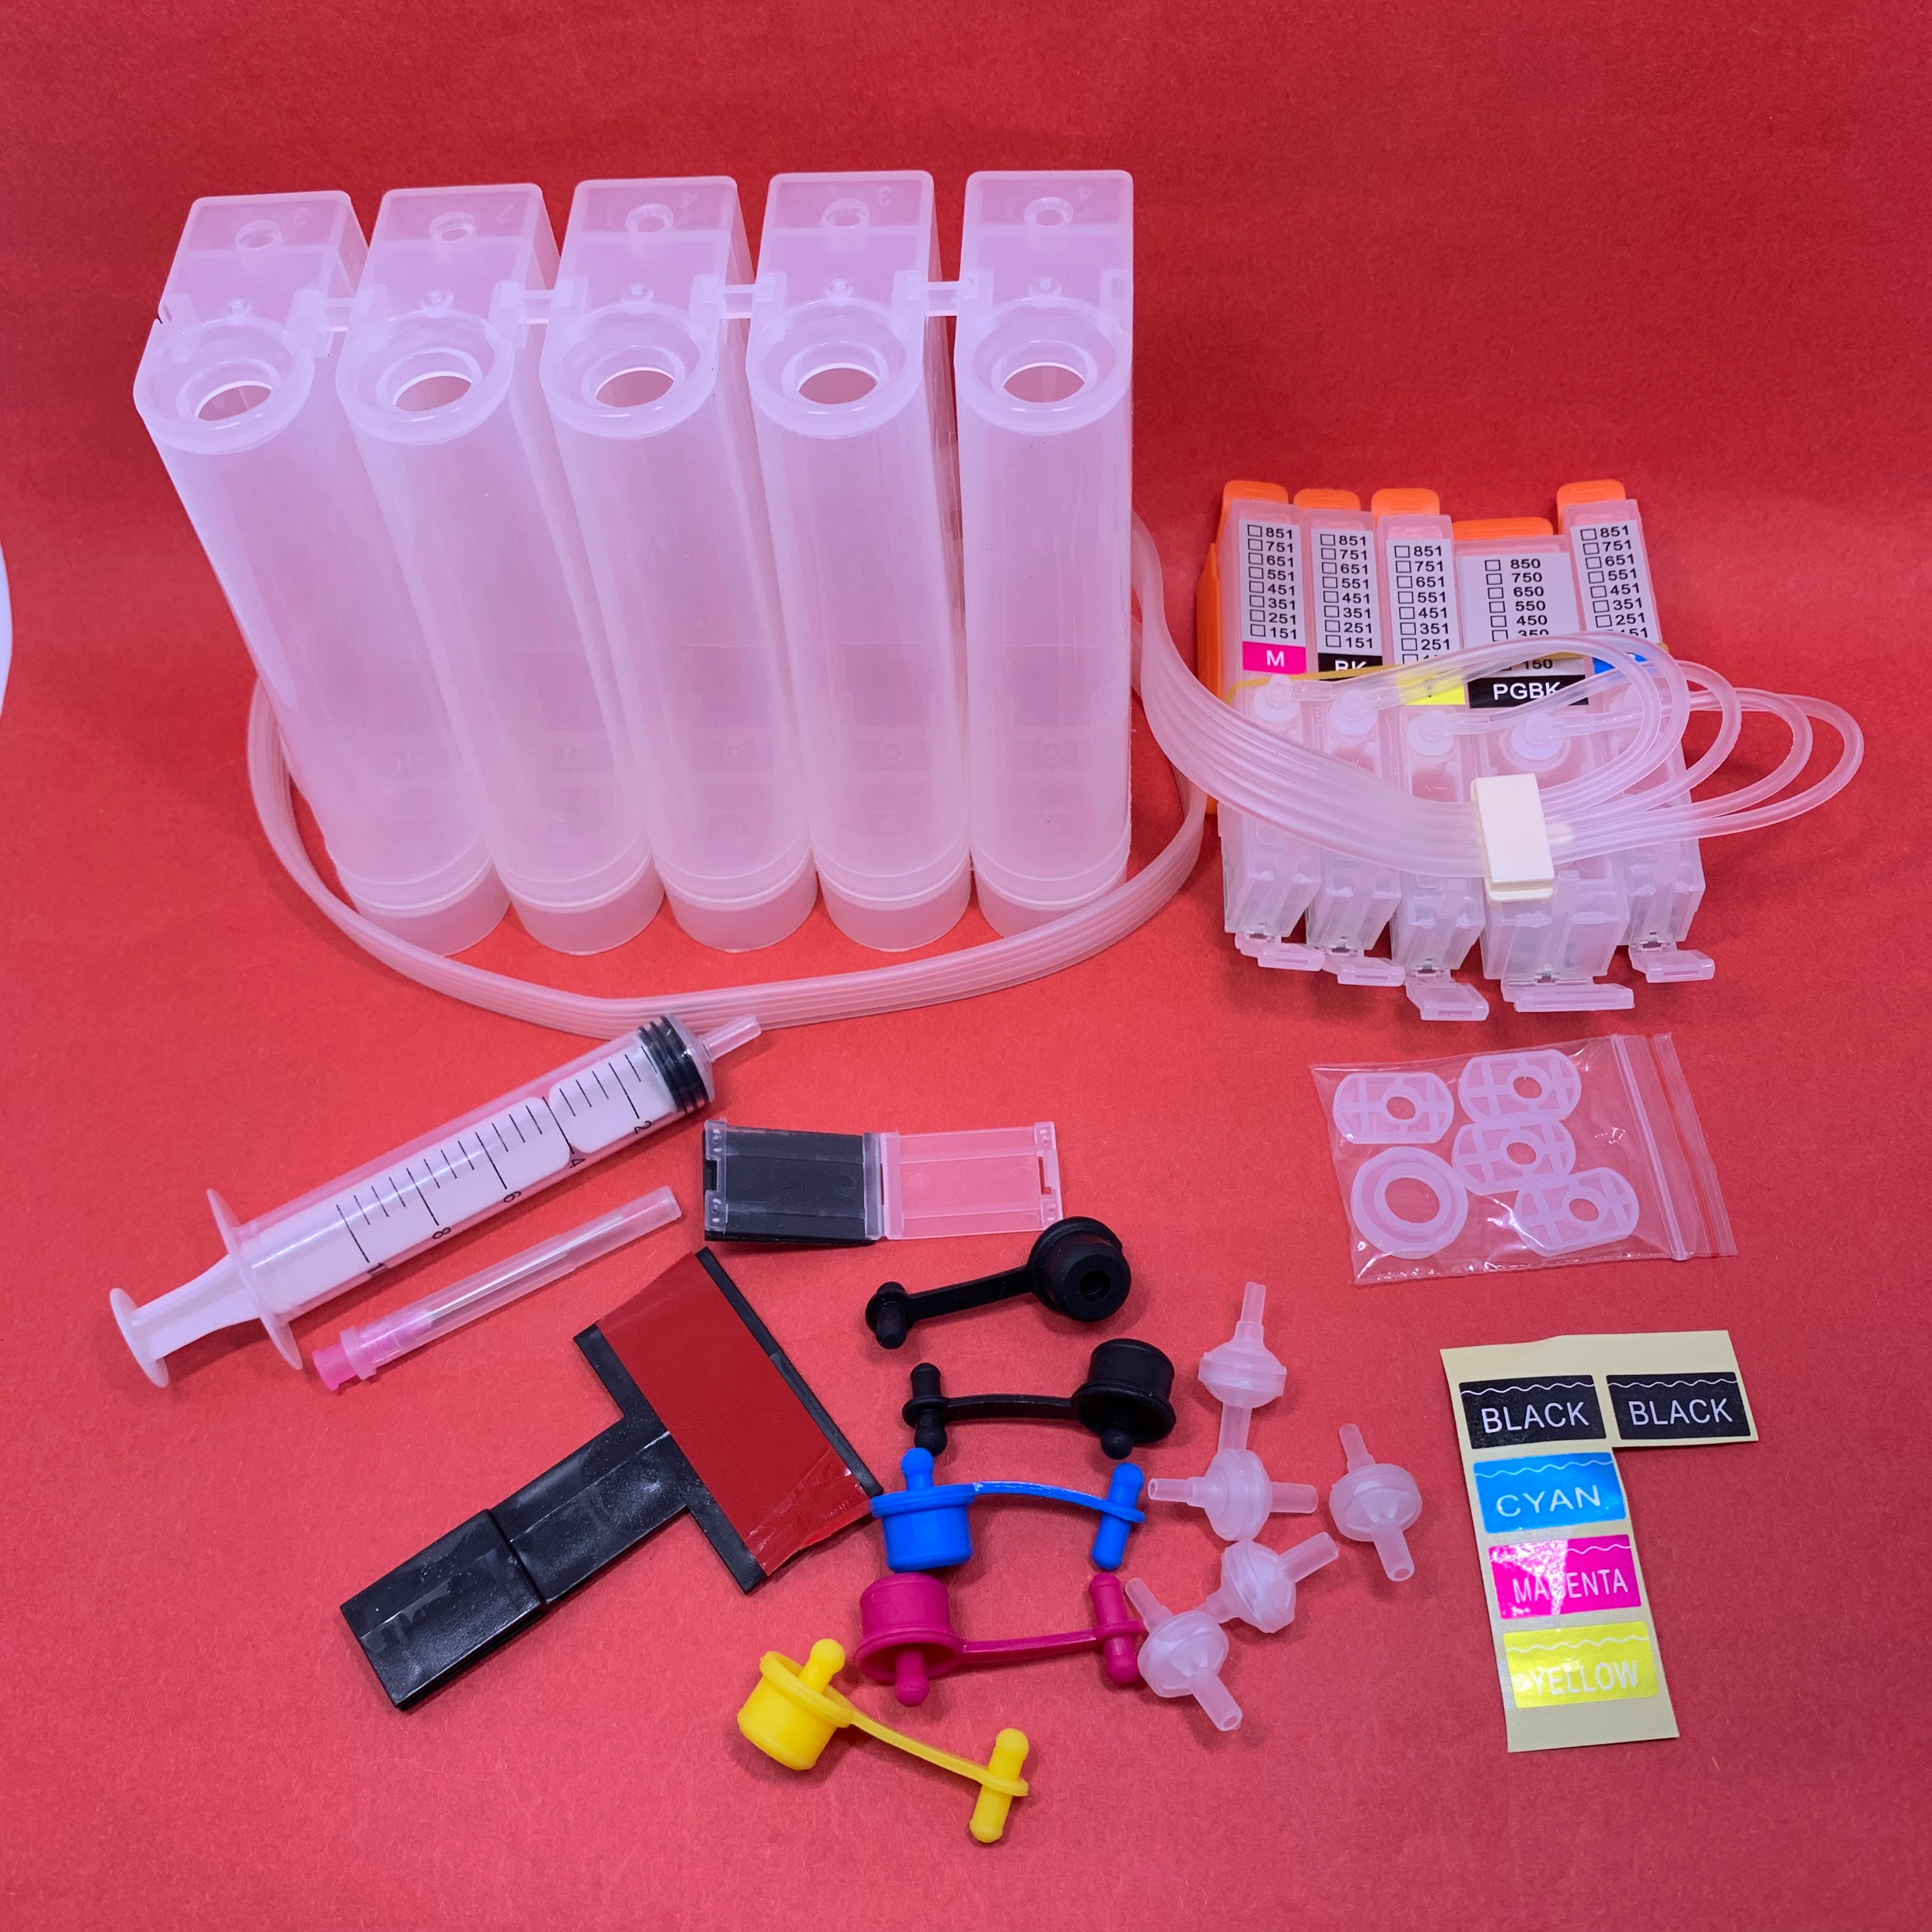 YOTAT 5color CISS ink cartridge PGI-550XL PGI-550 CLI-551 for Canon PIXMA IP7250 MG6350 MG5450 MX925 MG7150 MG6450 MG5550